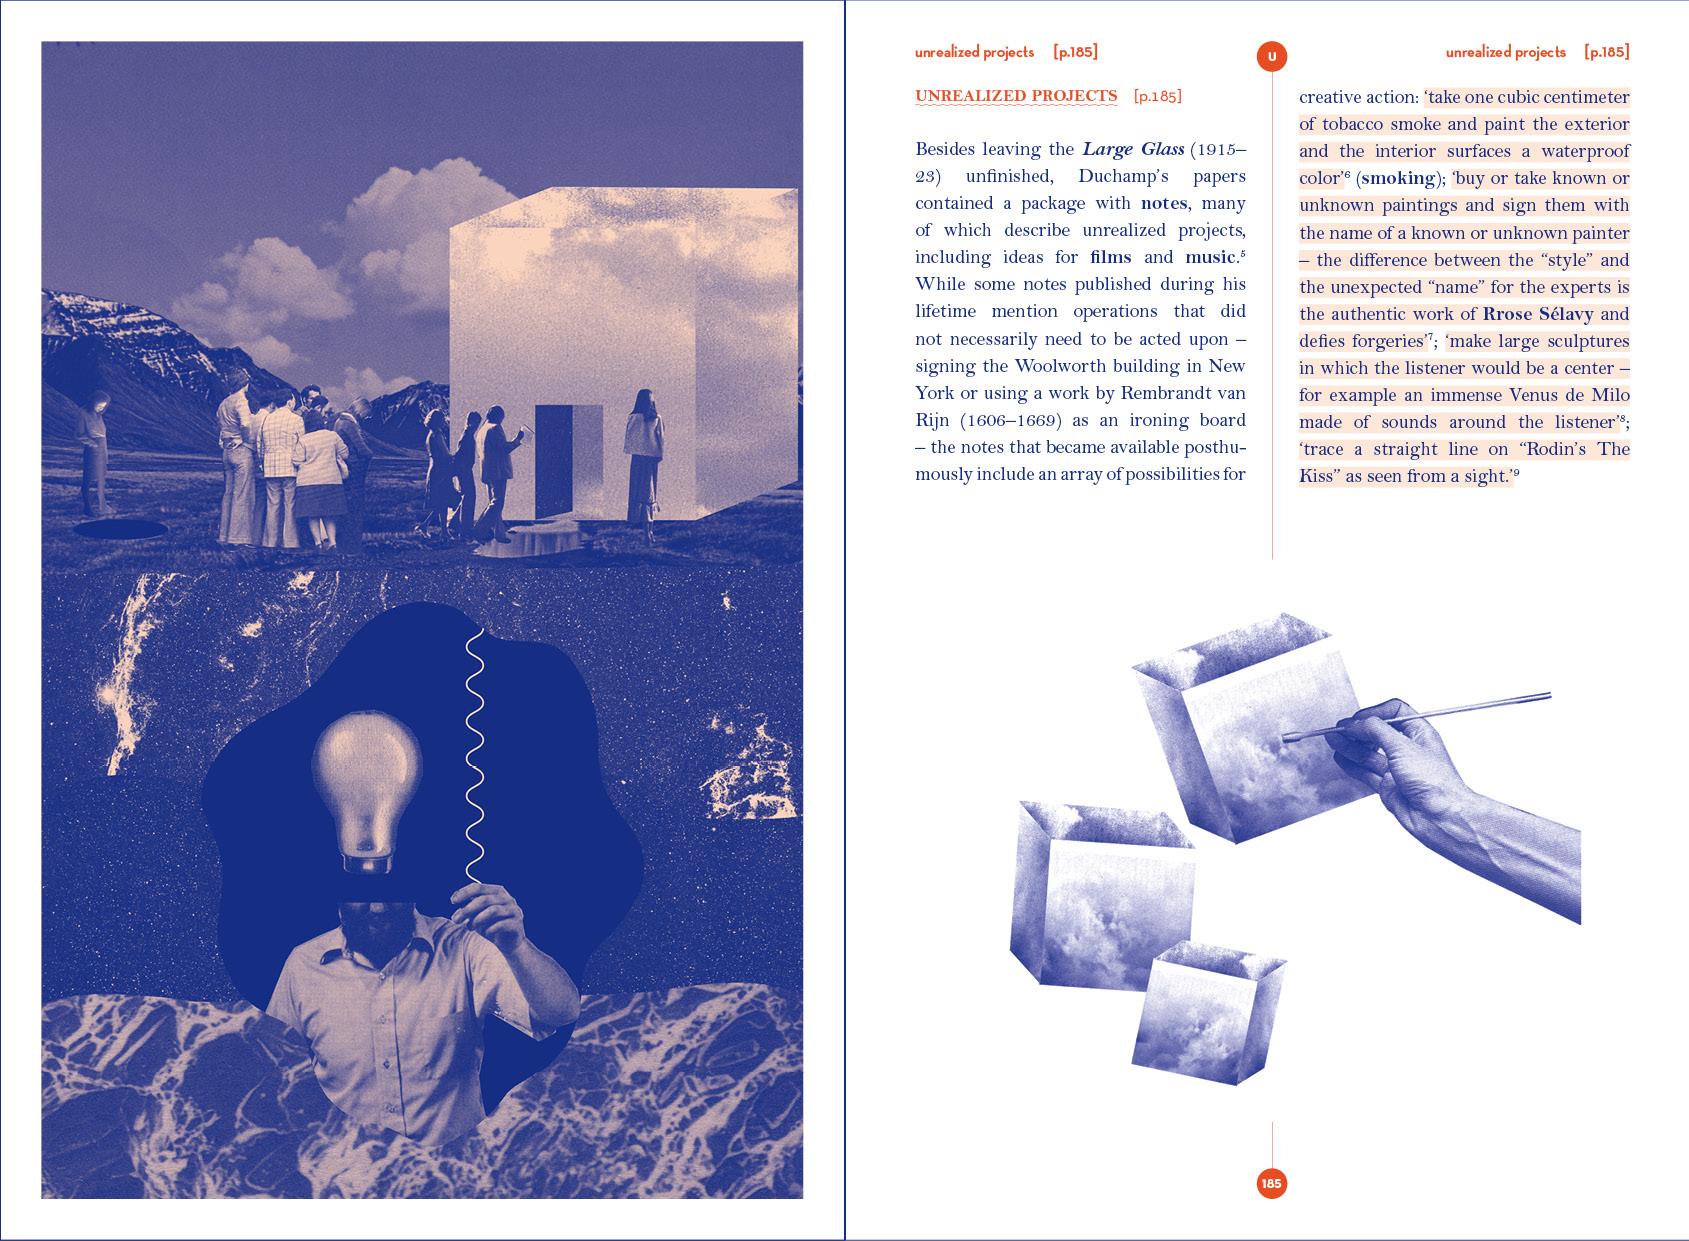 The Duchamp Dictionary